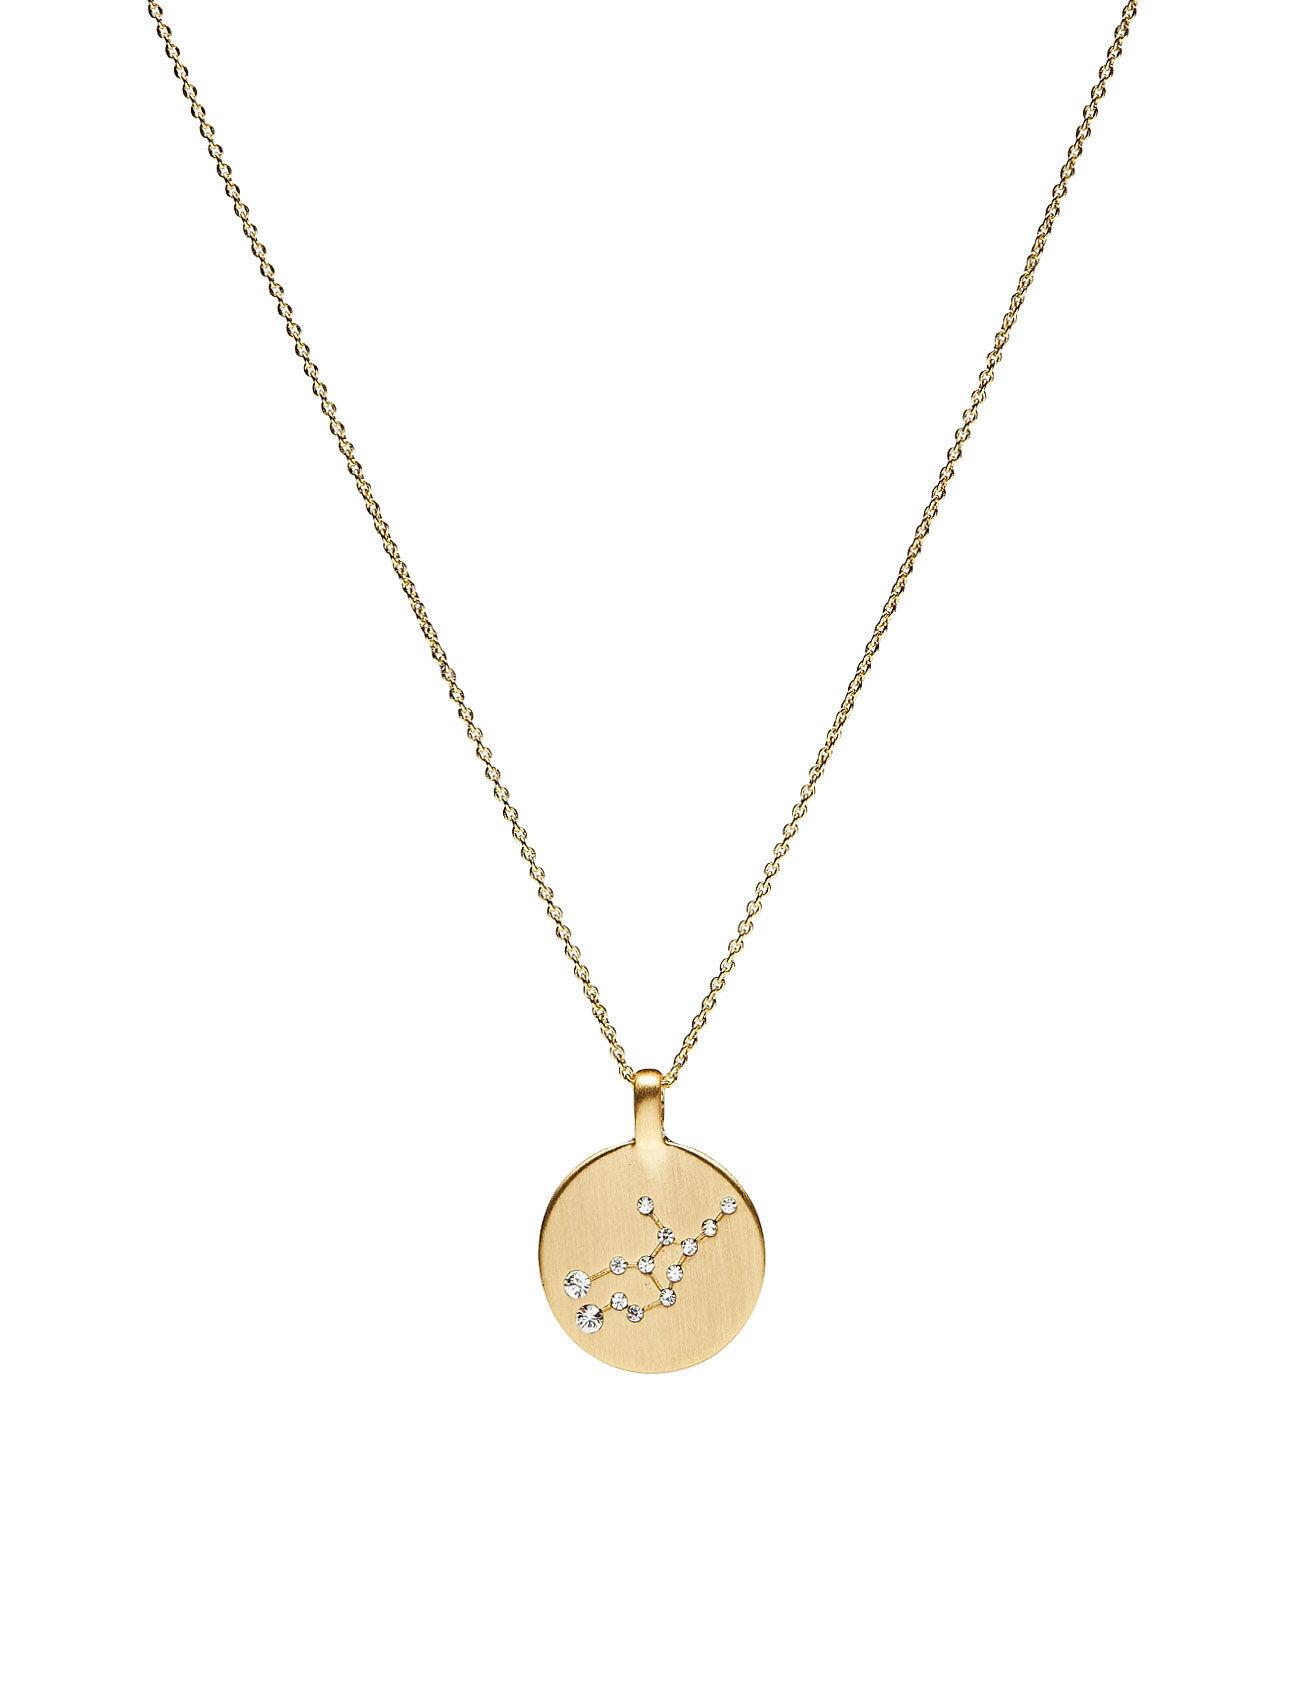 Pilgrim Virgo 24/08 - 23/09 Accessories Jewellery Necklaces Dainty Necklaces Kulta Pilgrim